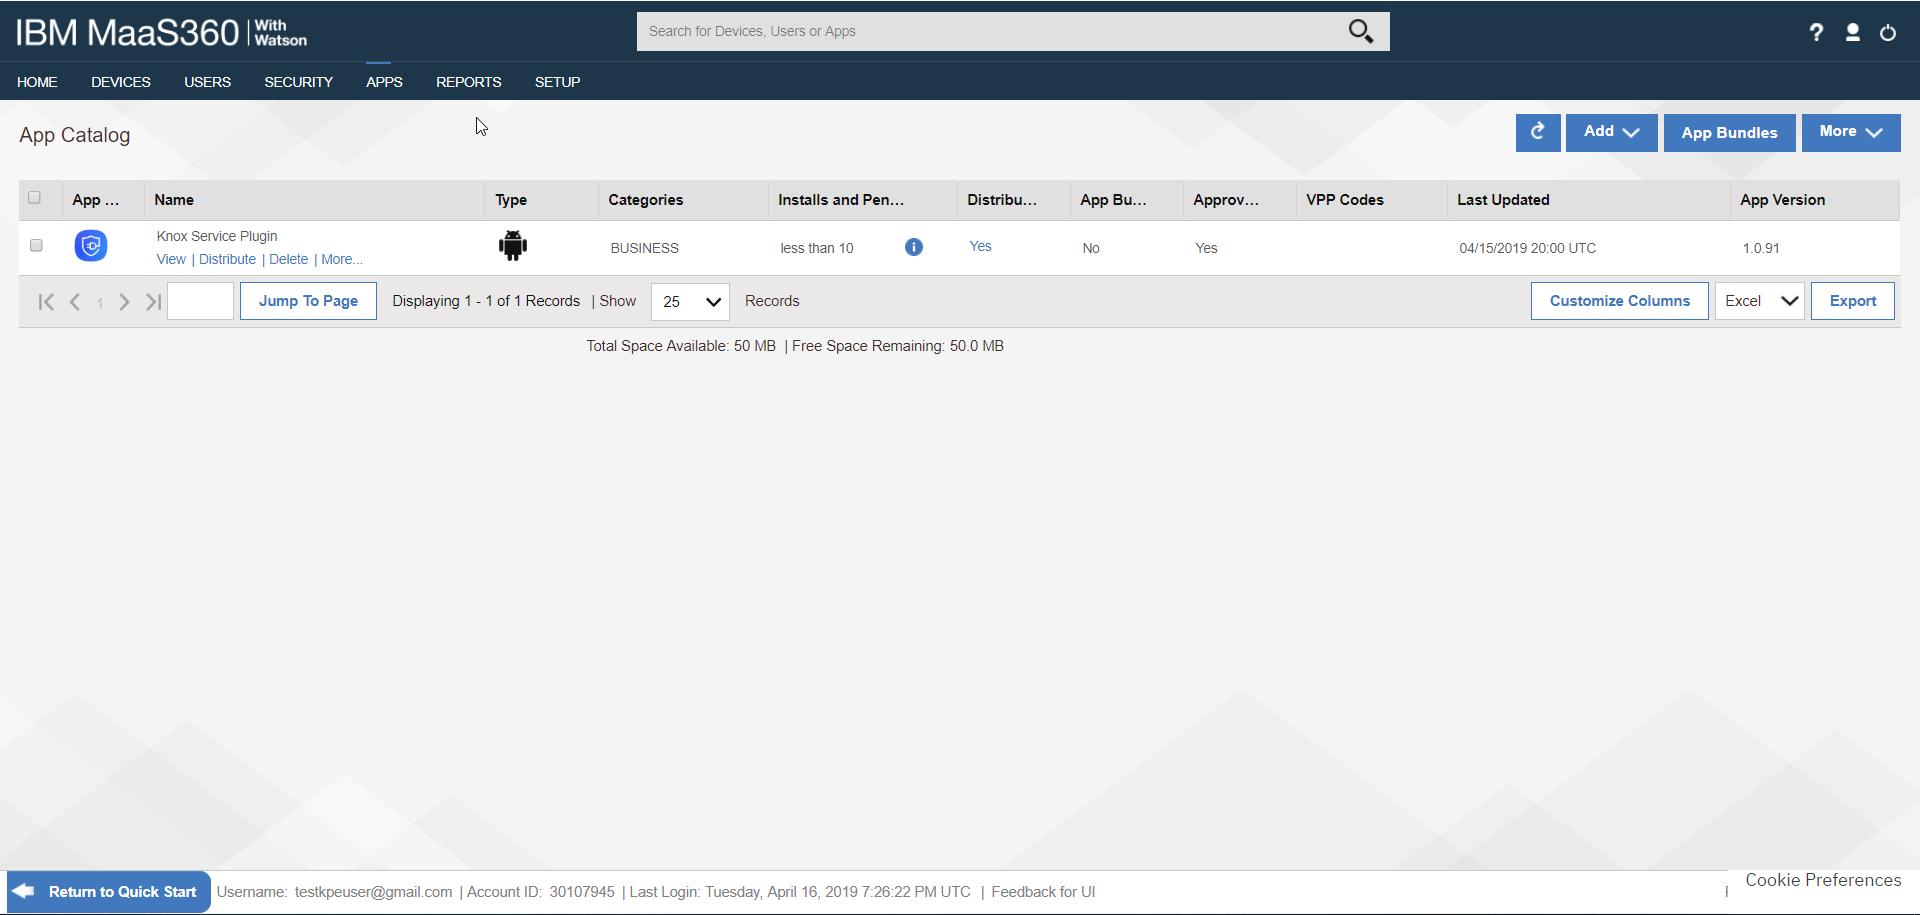 Deploy KSP - IBM MaaS360 App Catalog - List of Apps